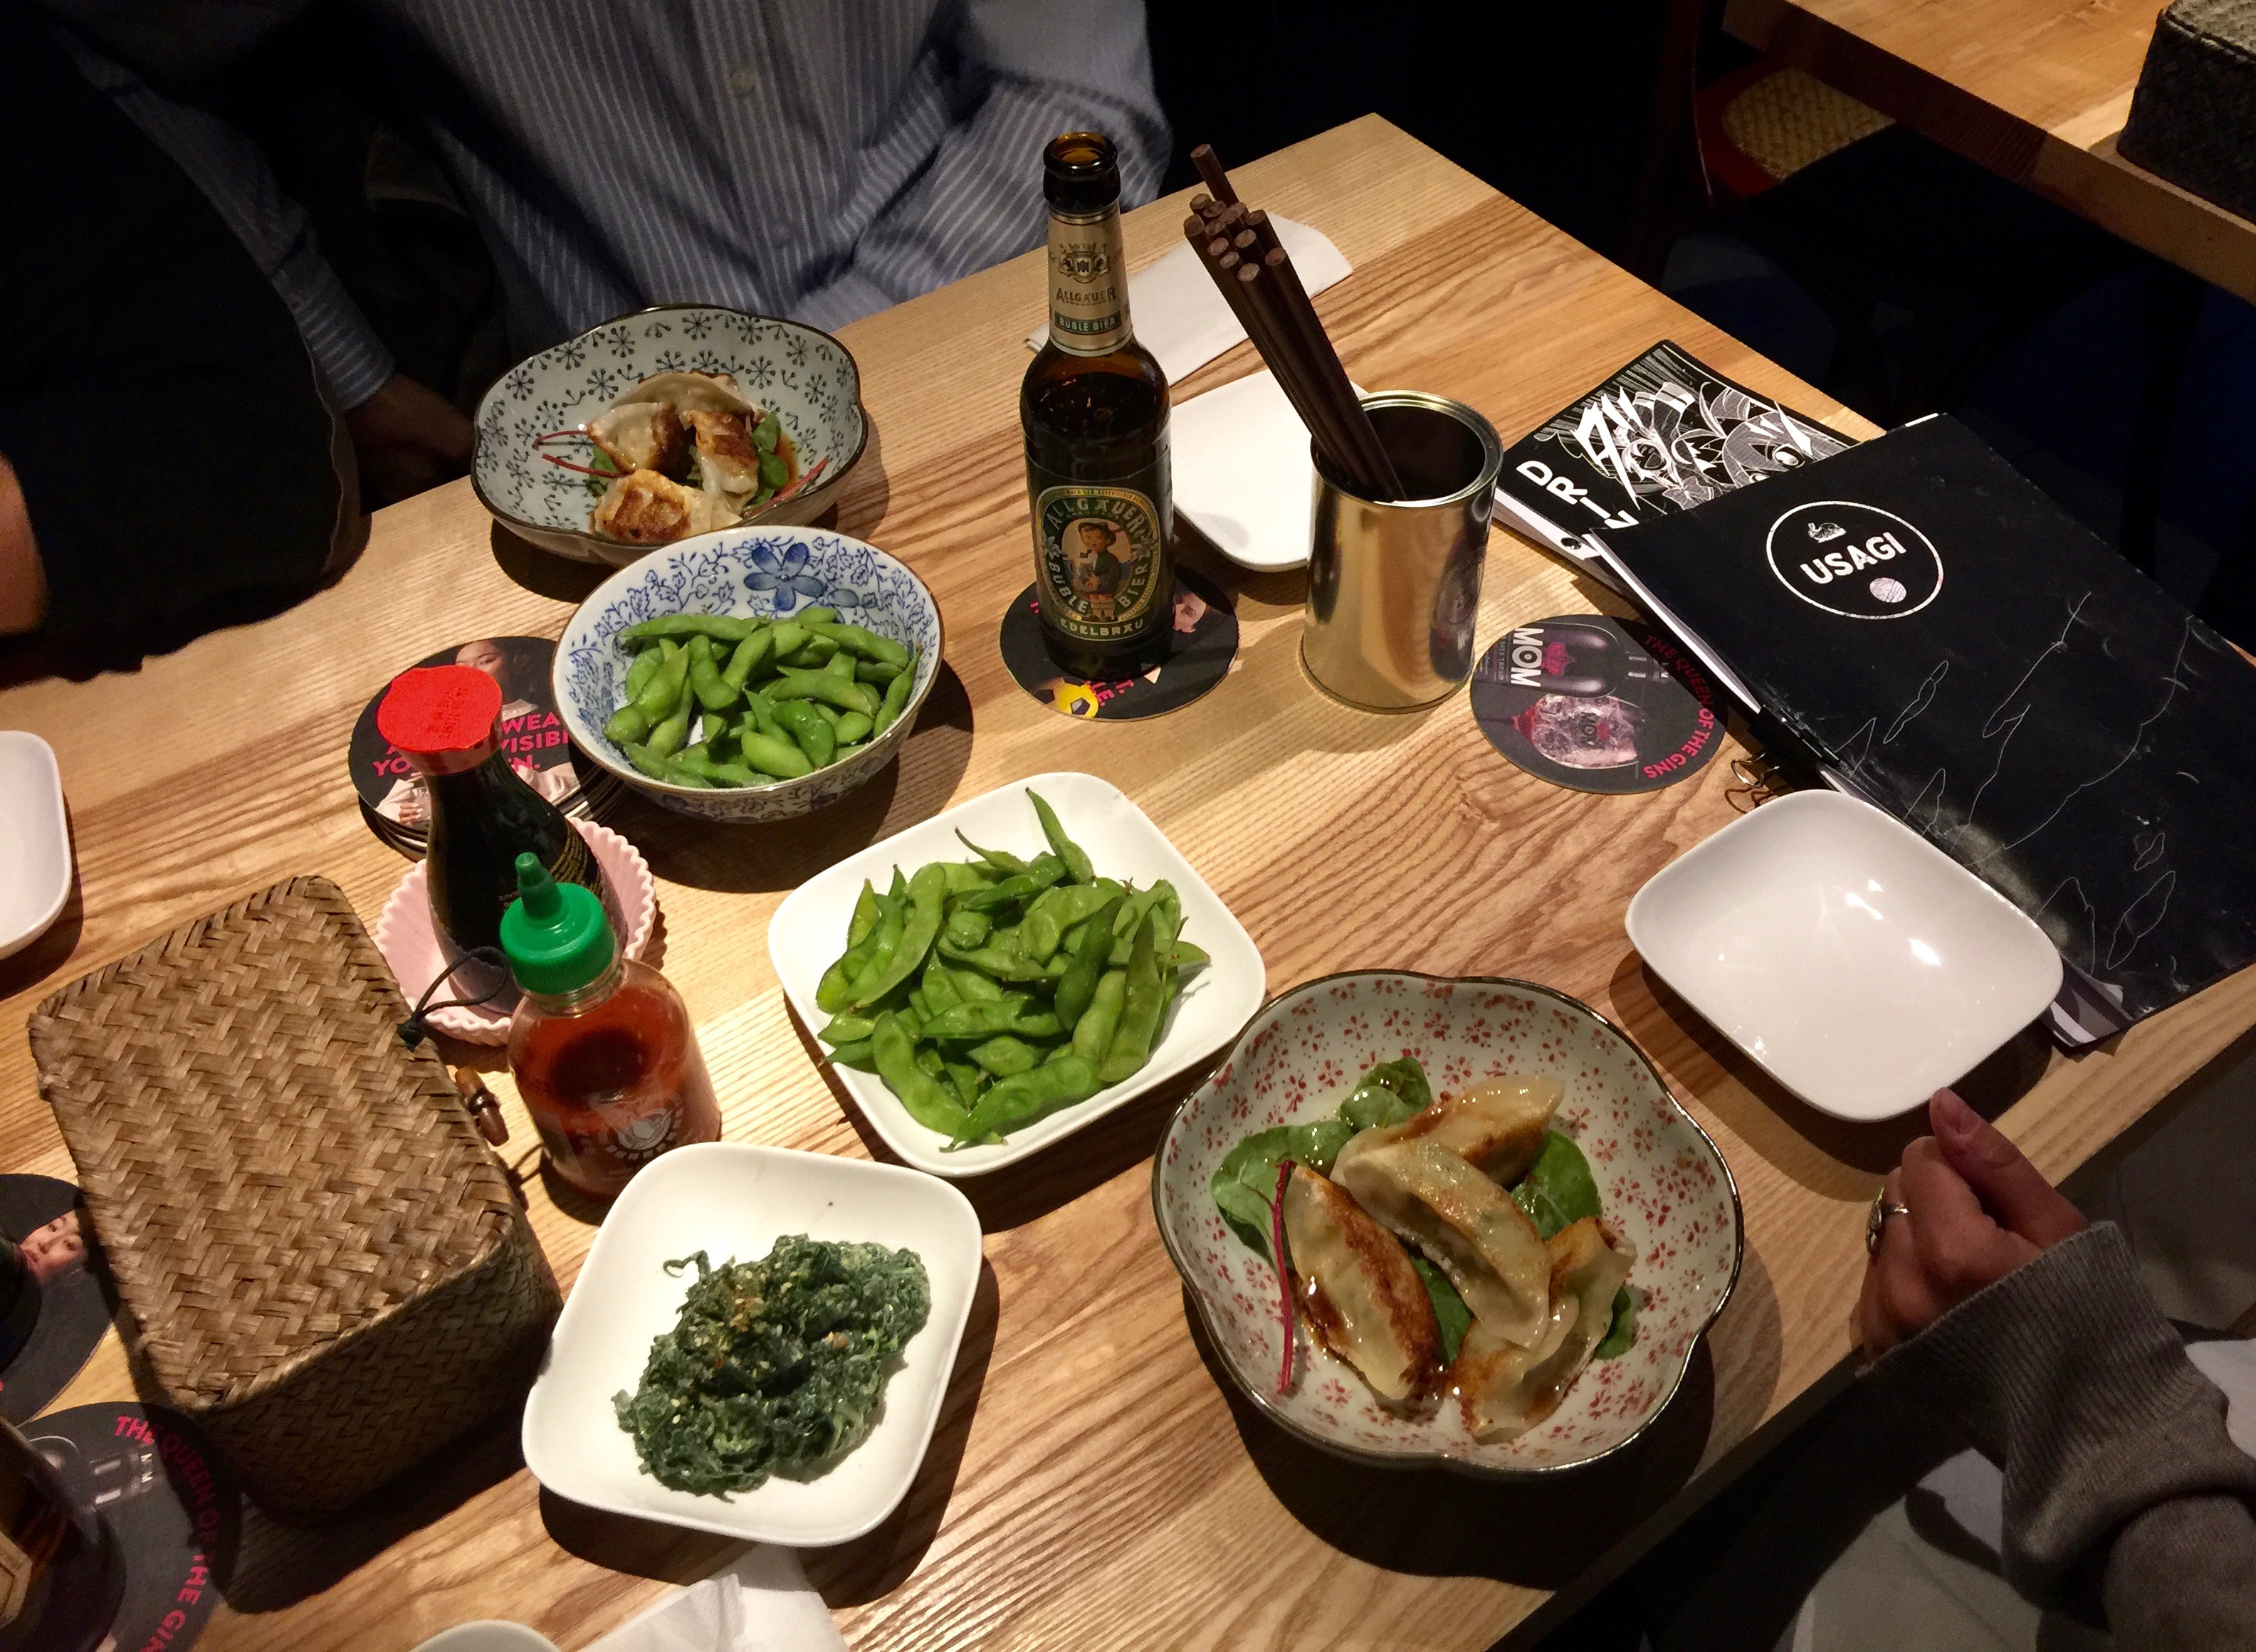 Usagi: Restaurant, Izakaya & Bar im Glockenbachviertel